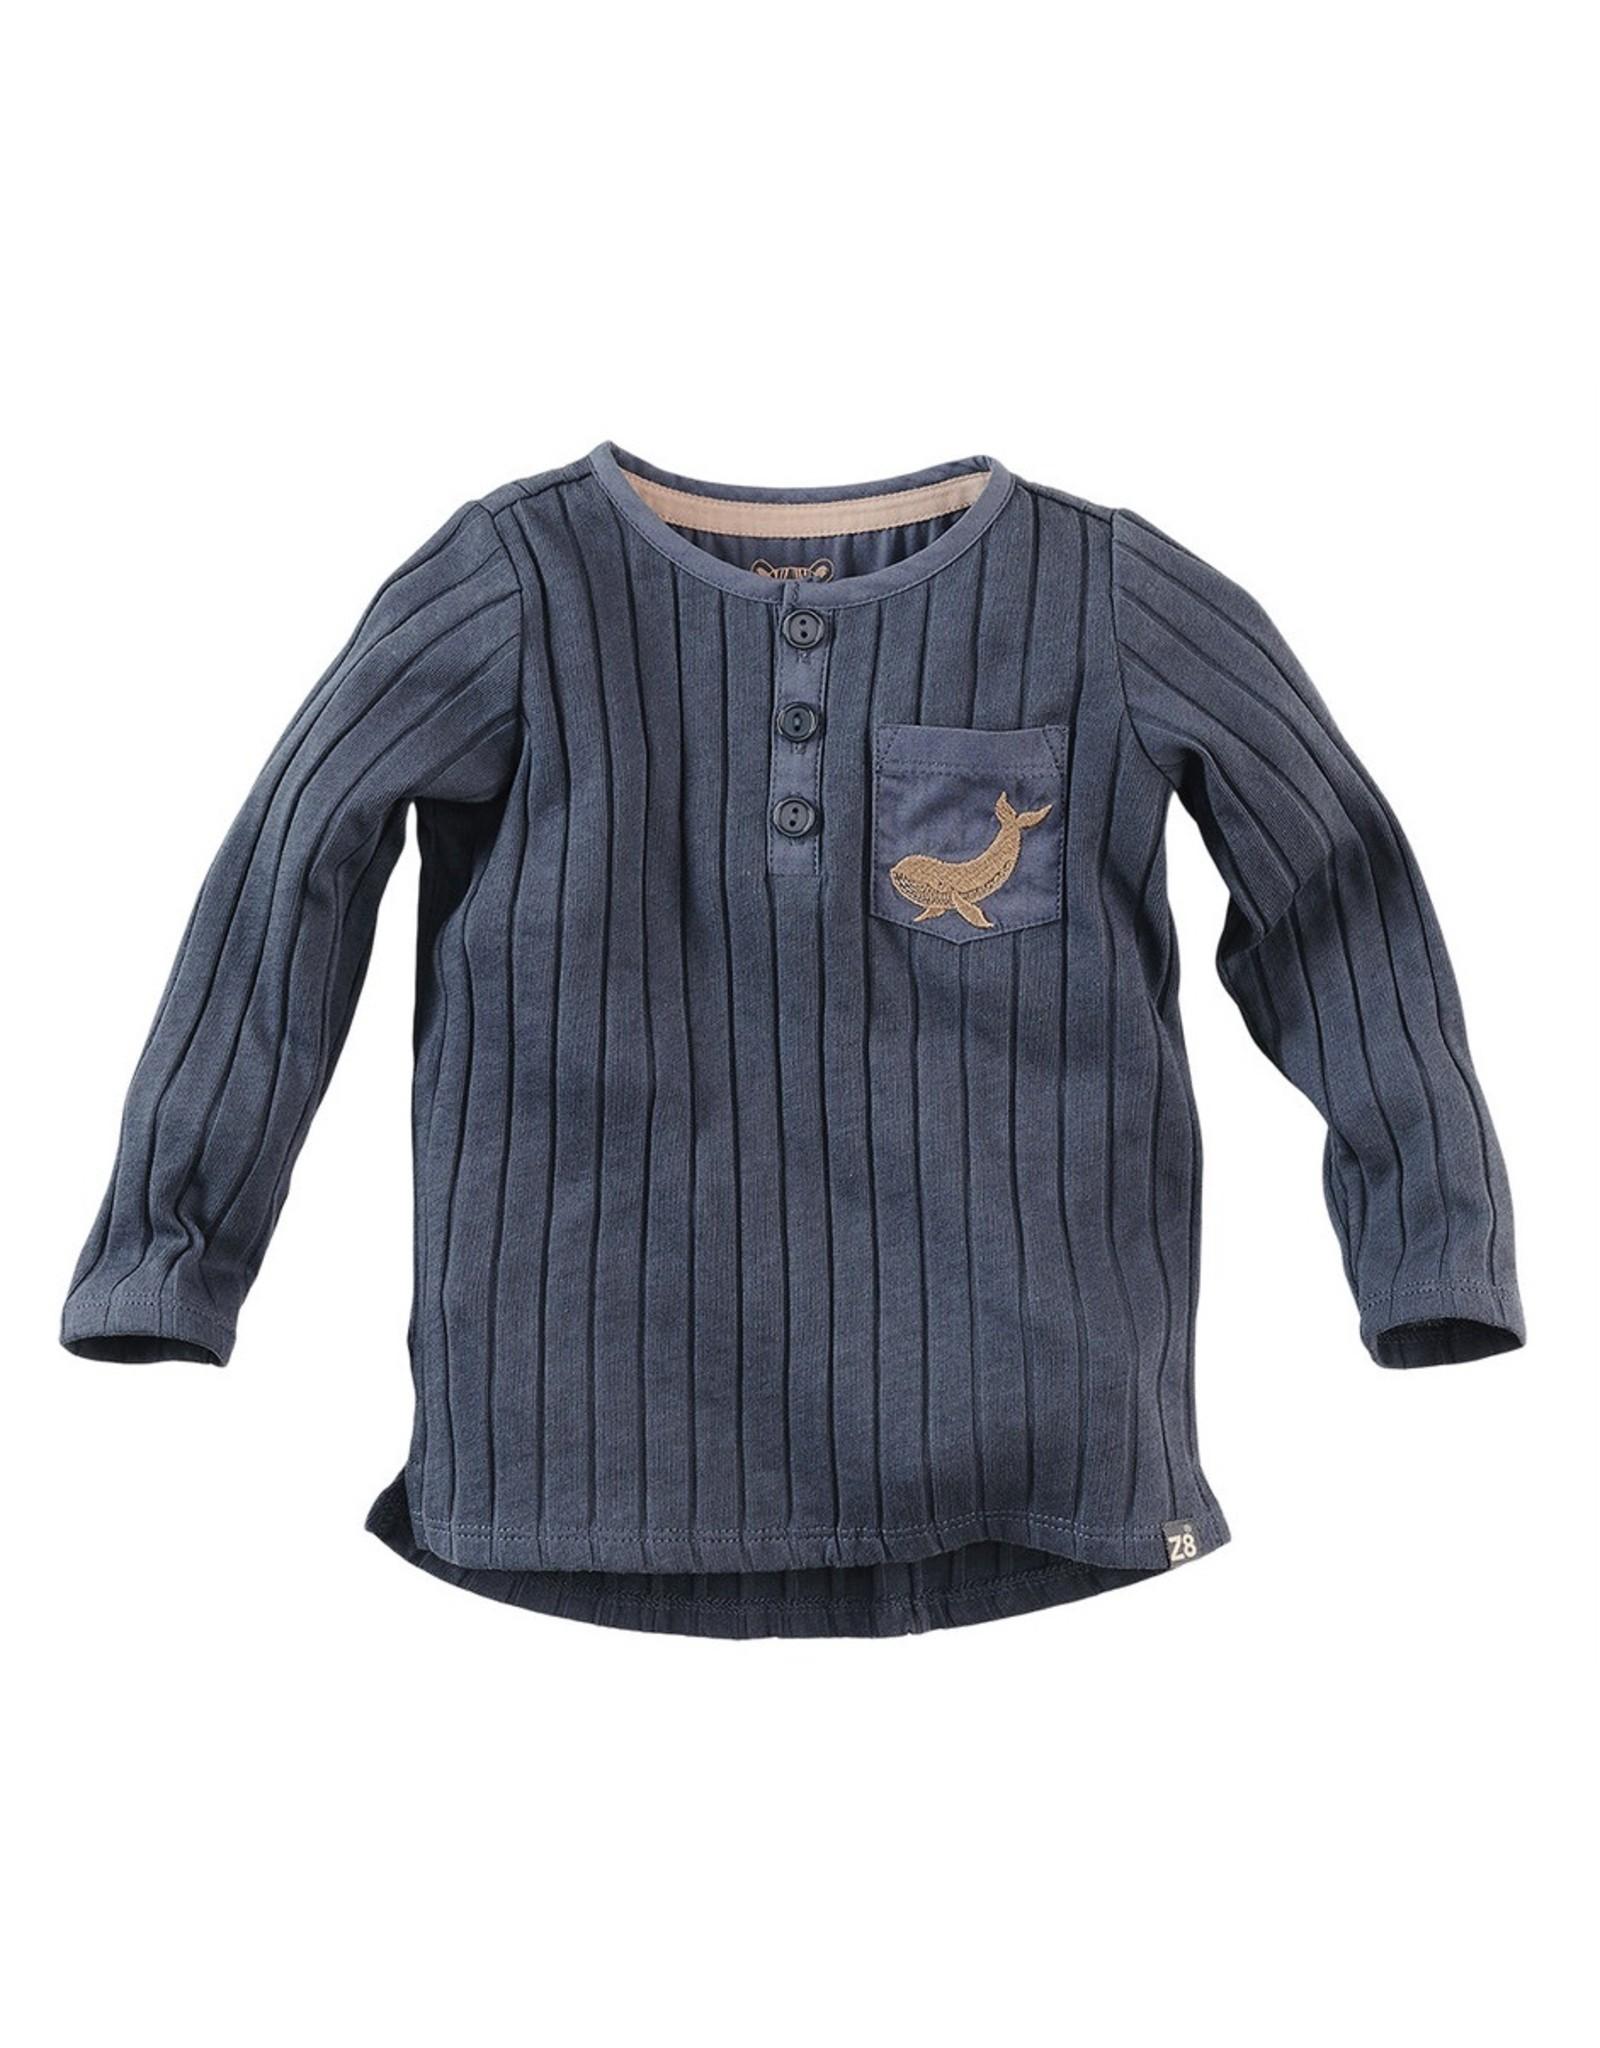 Z8 Abu T-Shirt